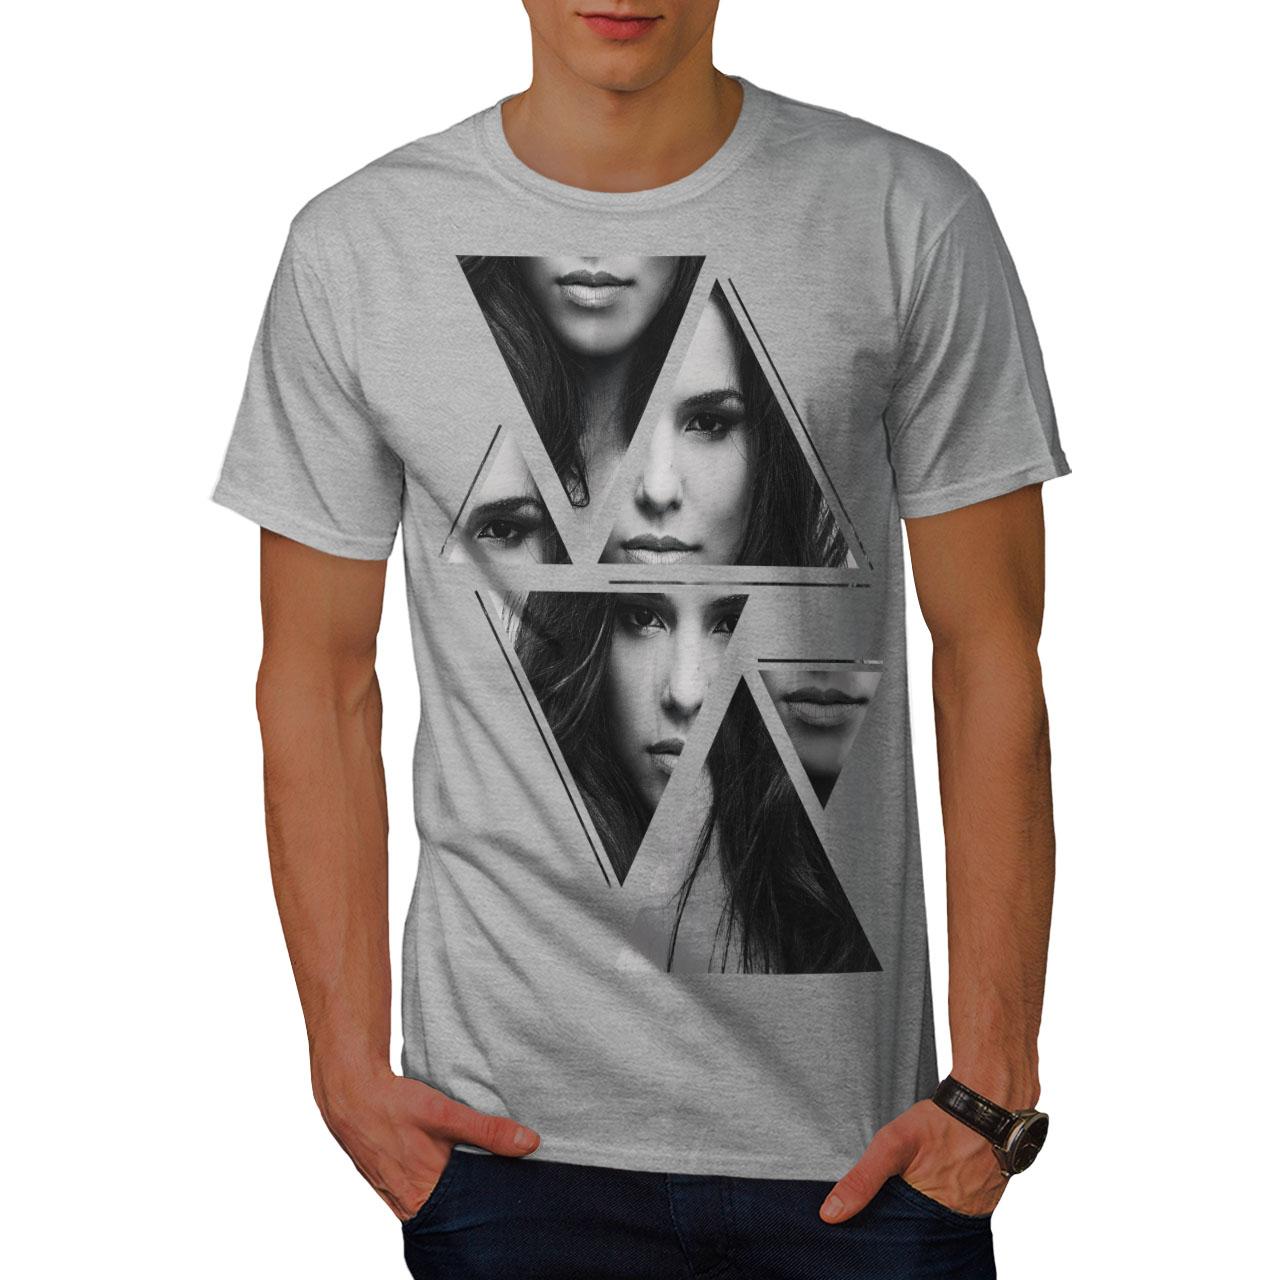 Wellcoda-Art-Fashion-Face-T-shirt-homme-Abstract-Design-graphique-imprime-Tee miniature 15